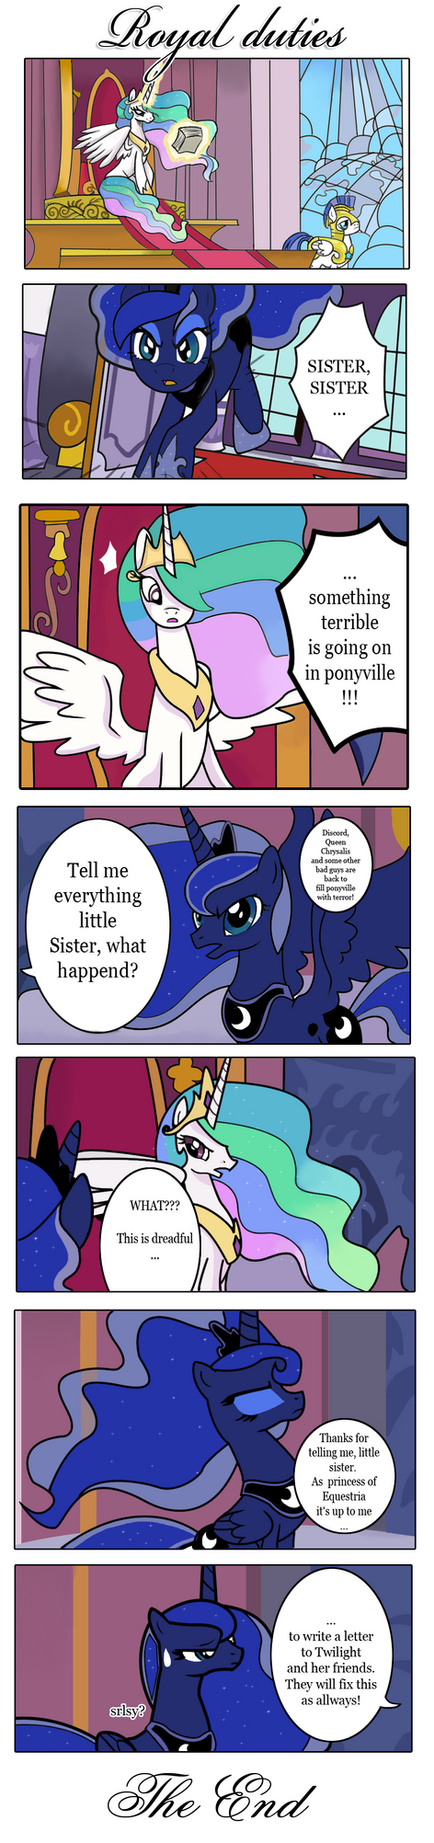 Royal duties by schnuffitrunks